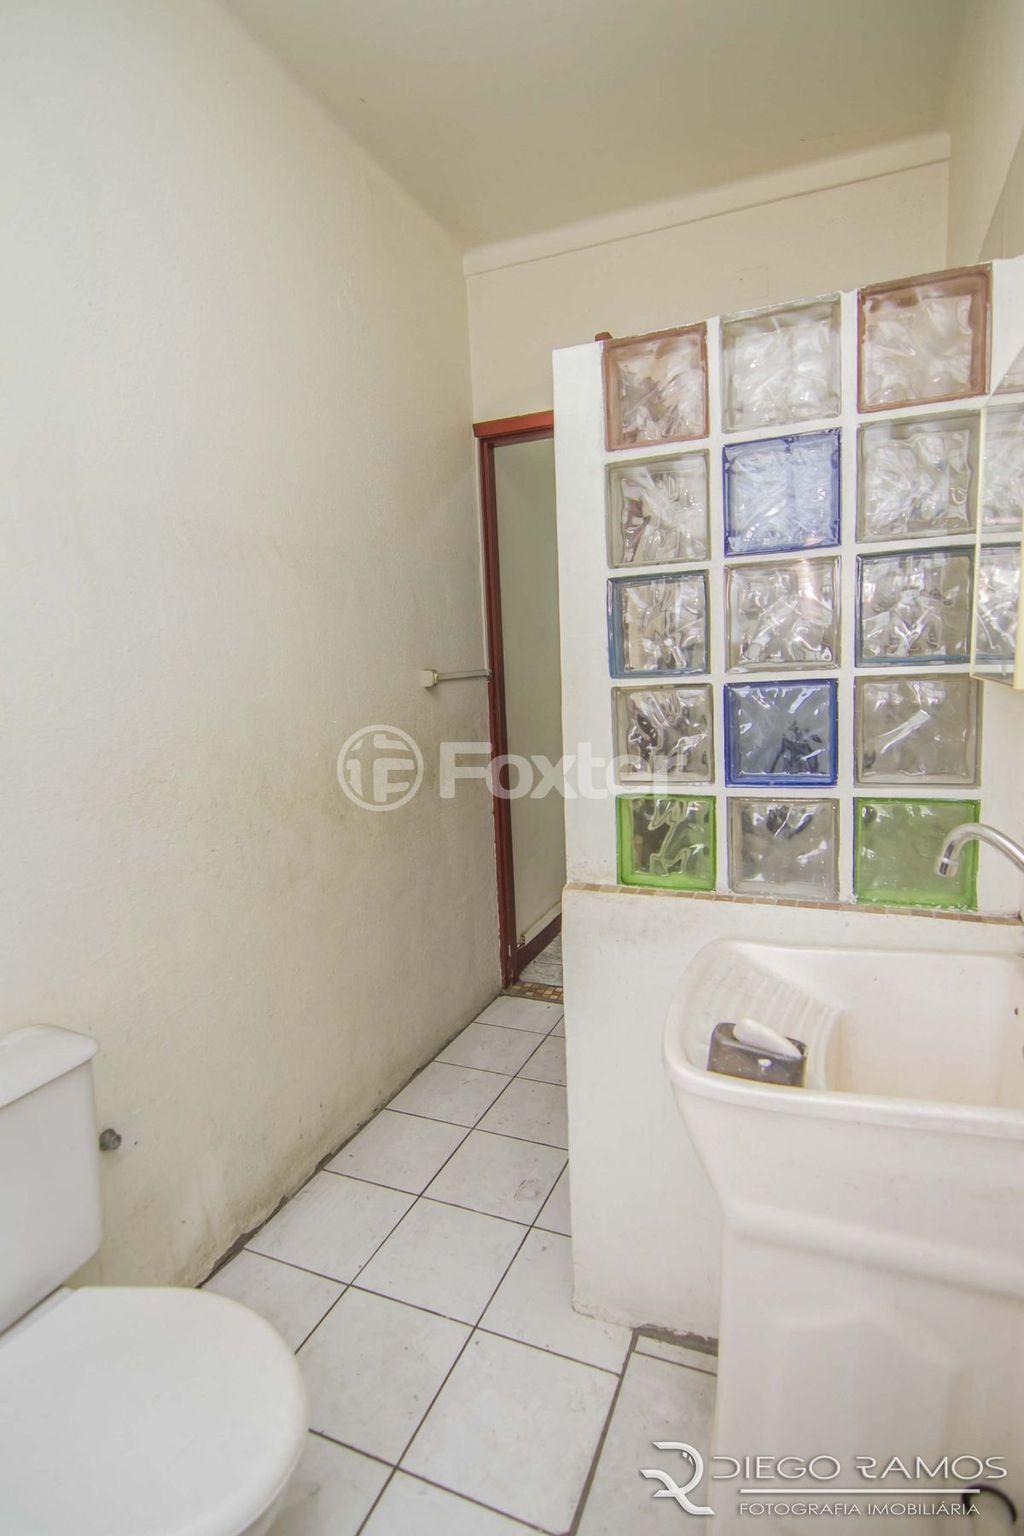 Apto 2 Dorm, Centro Histórico, Porto Alegre (122853) - Foto 9